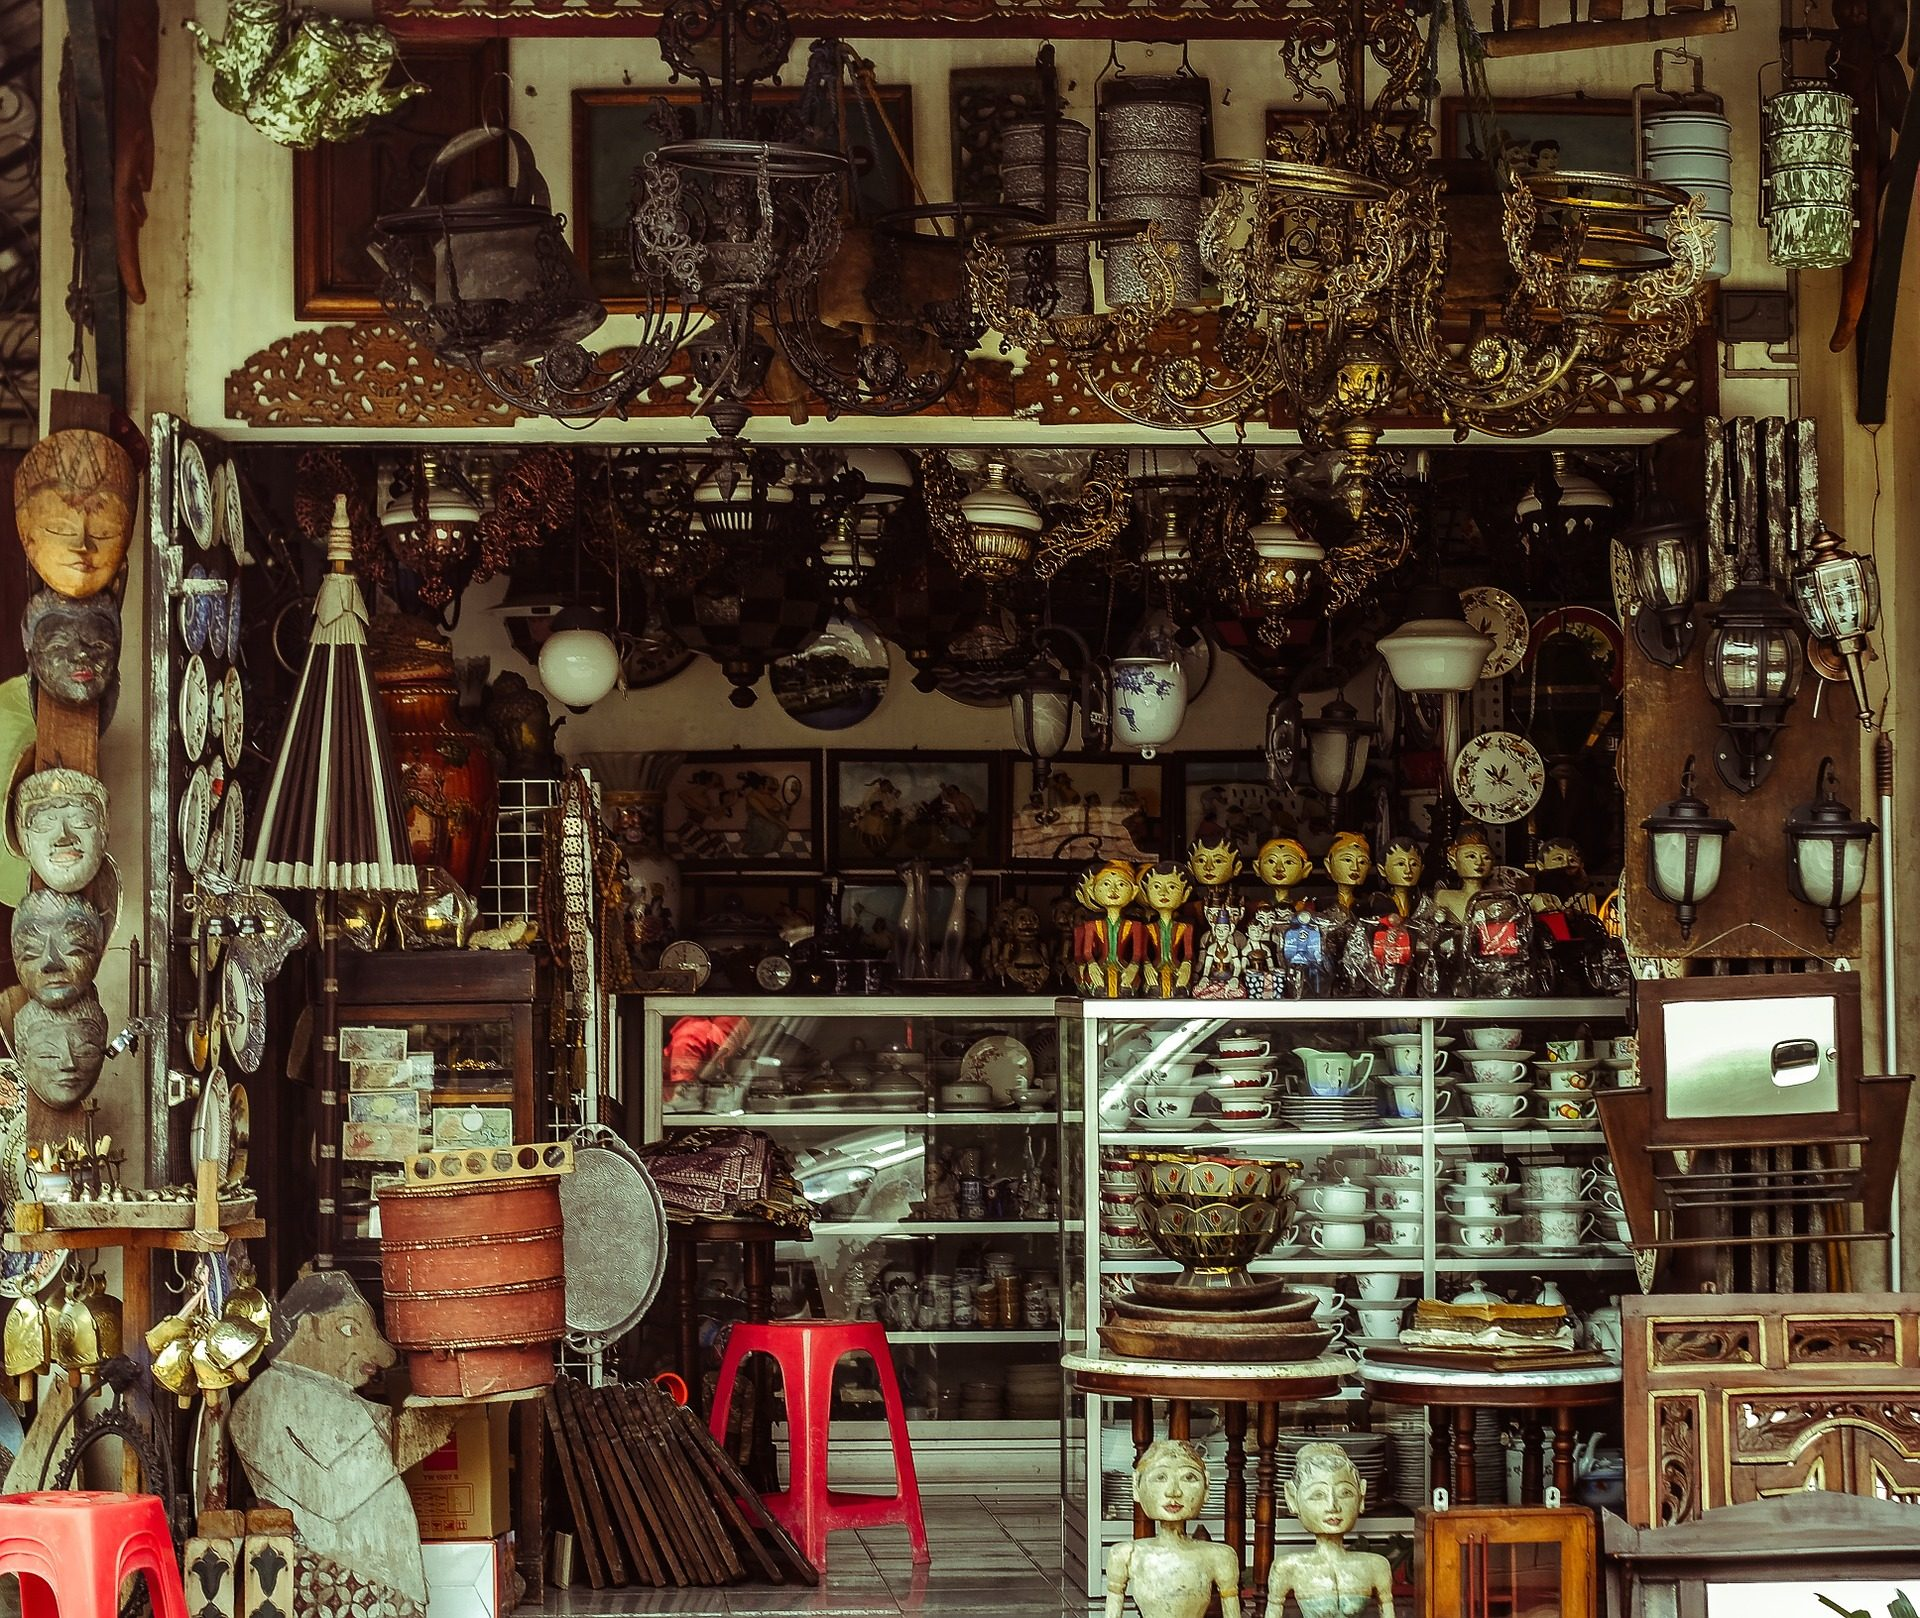 Магазин, базар, цифры, antigüedades, сувениры, Винтаж - Обои HD - Профессор falken.com